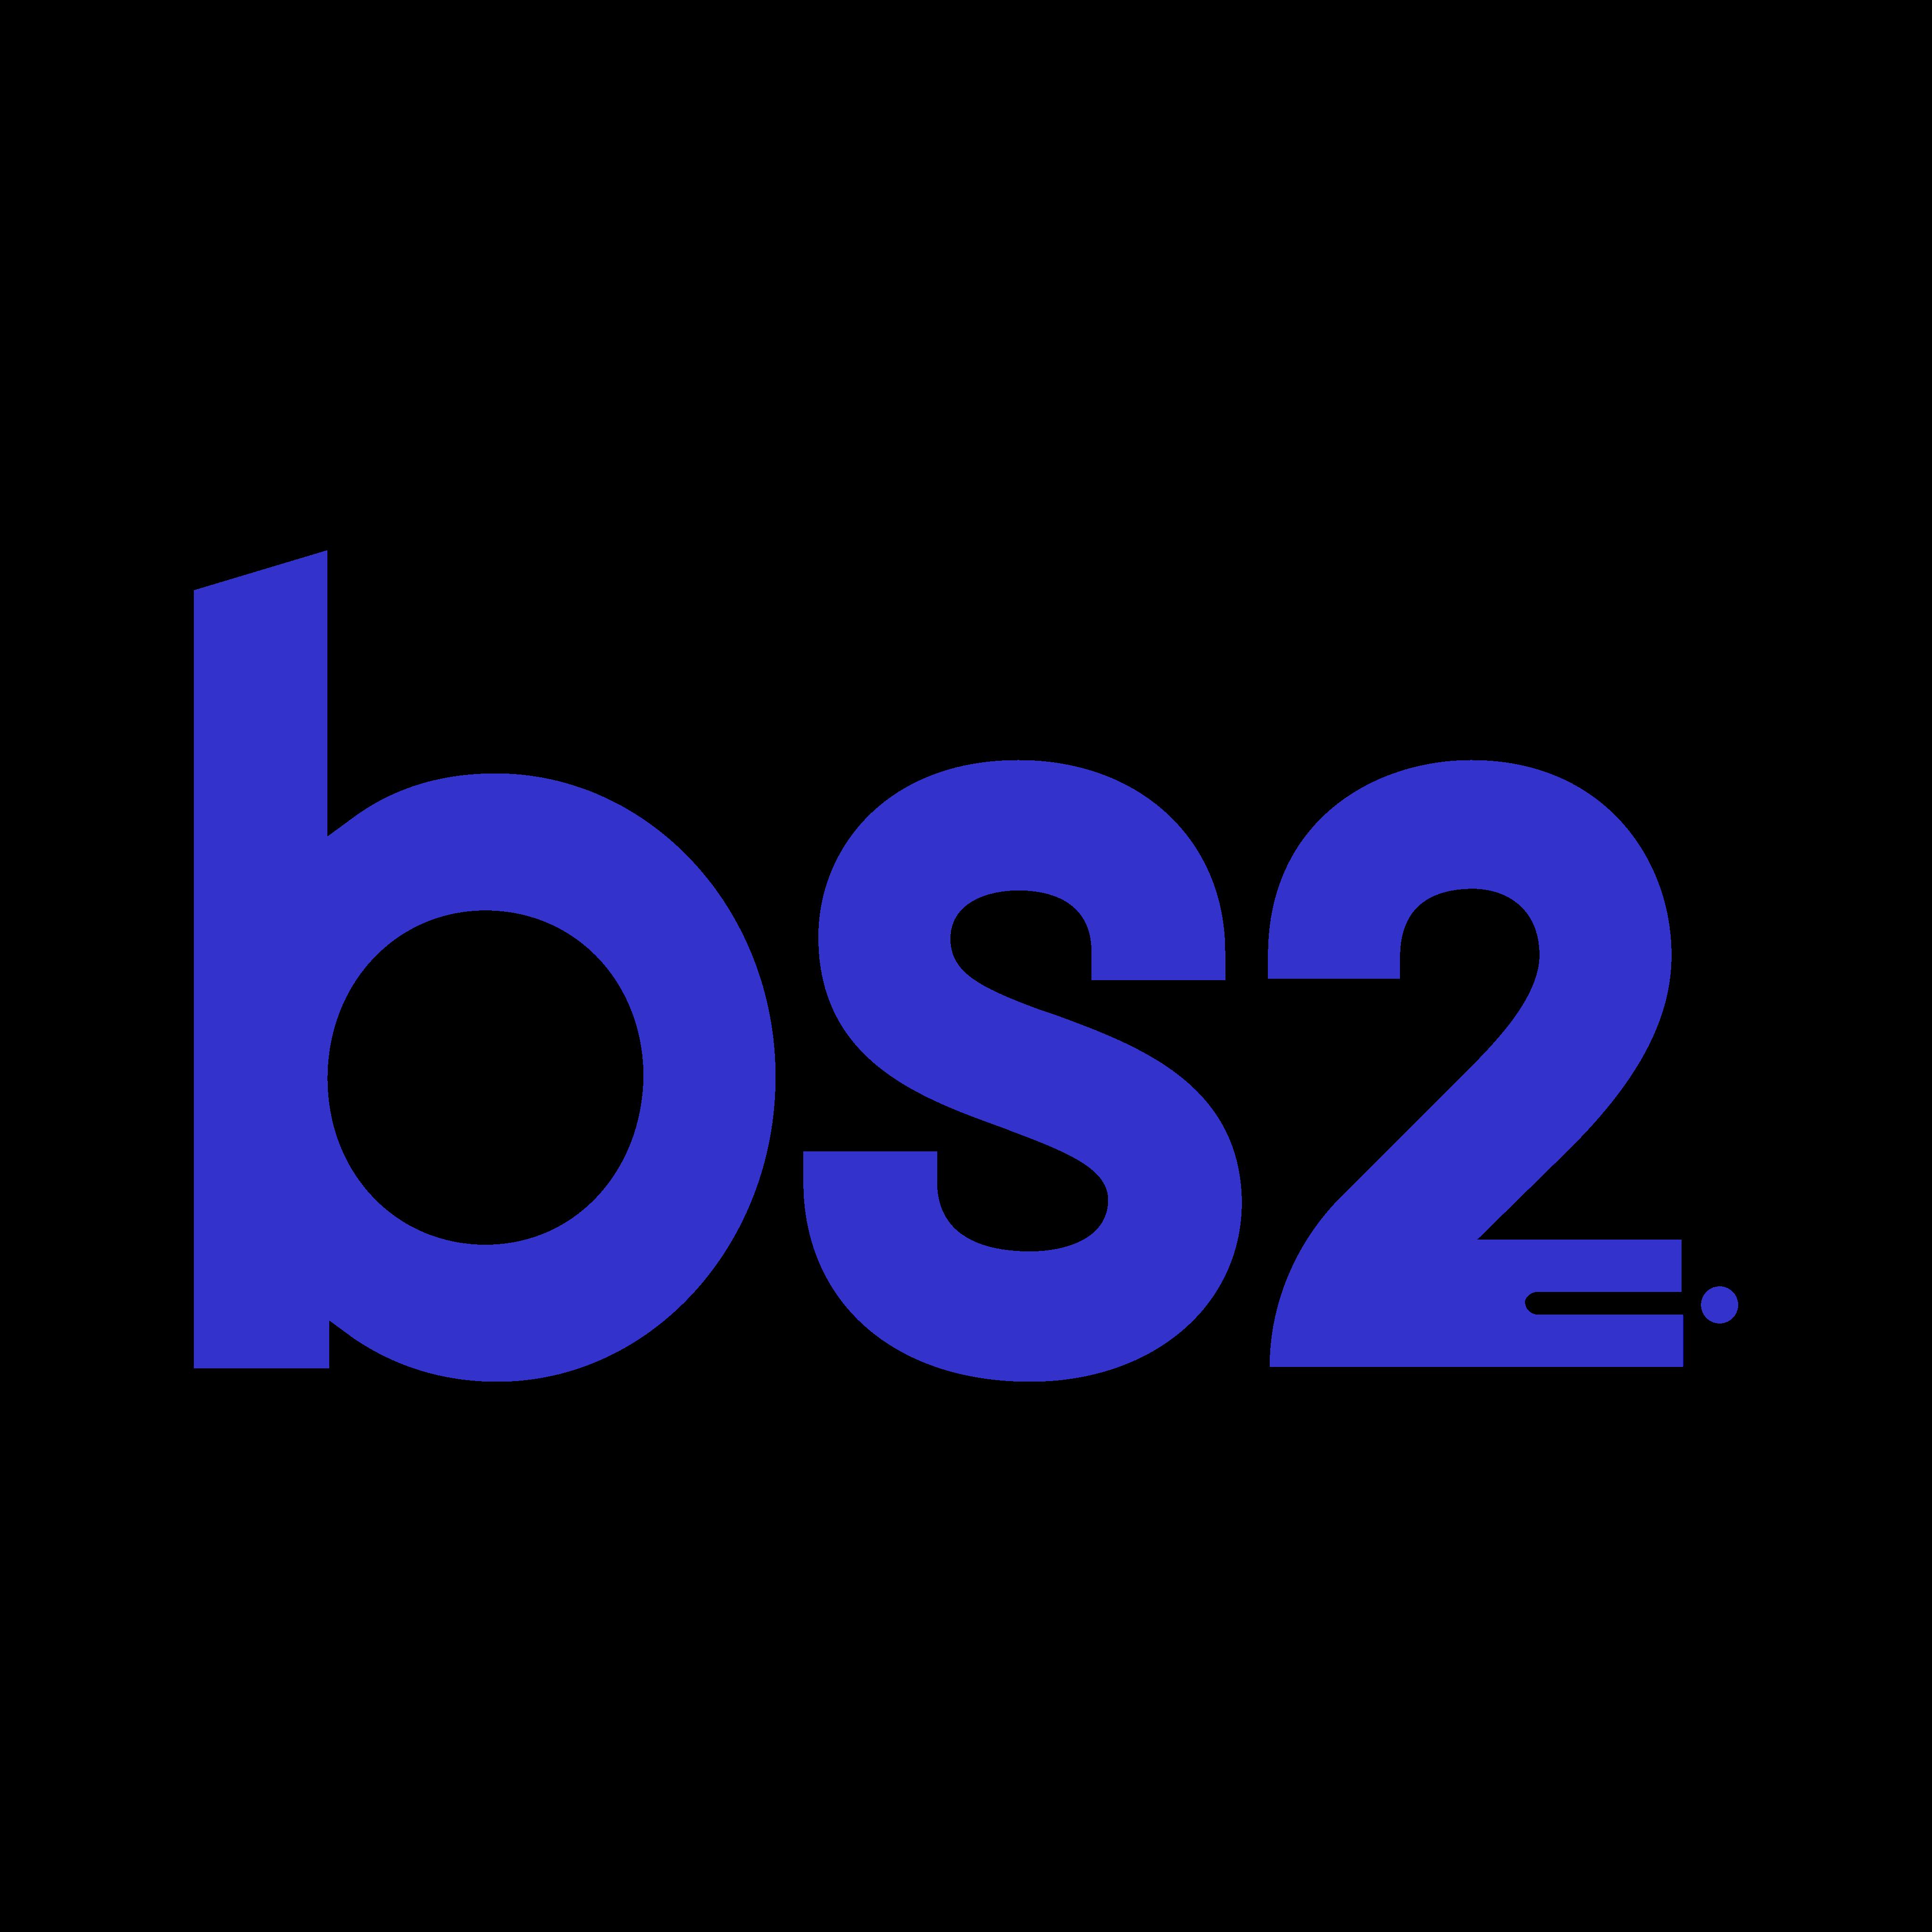 banco bs2 logo 0 - Banco BS2 Logo